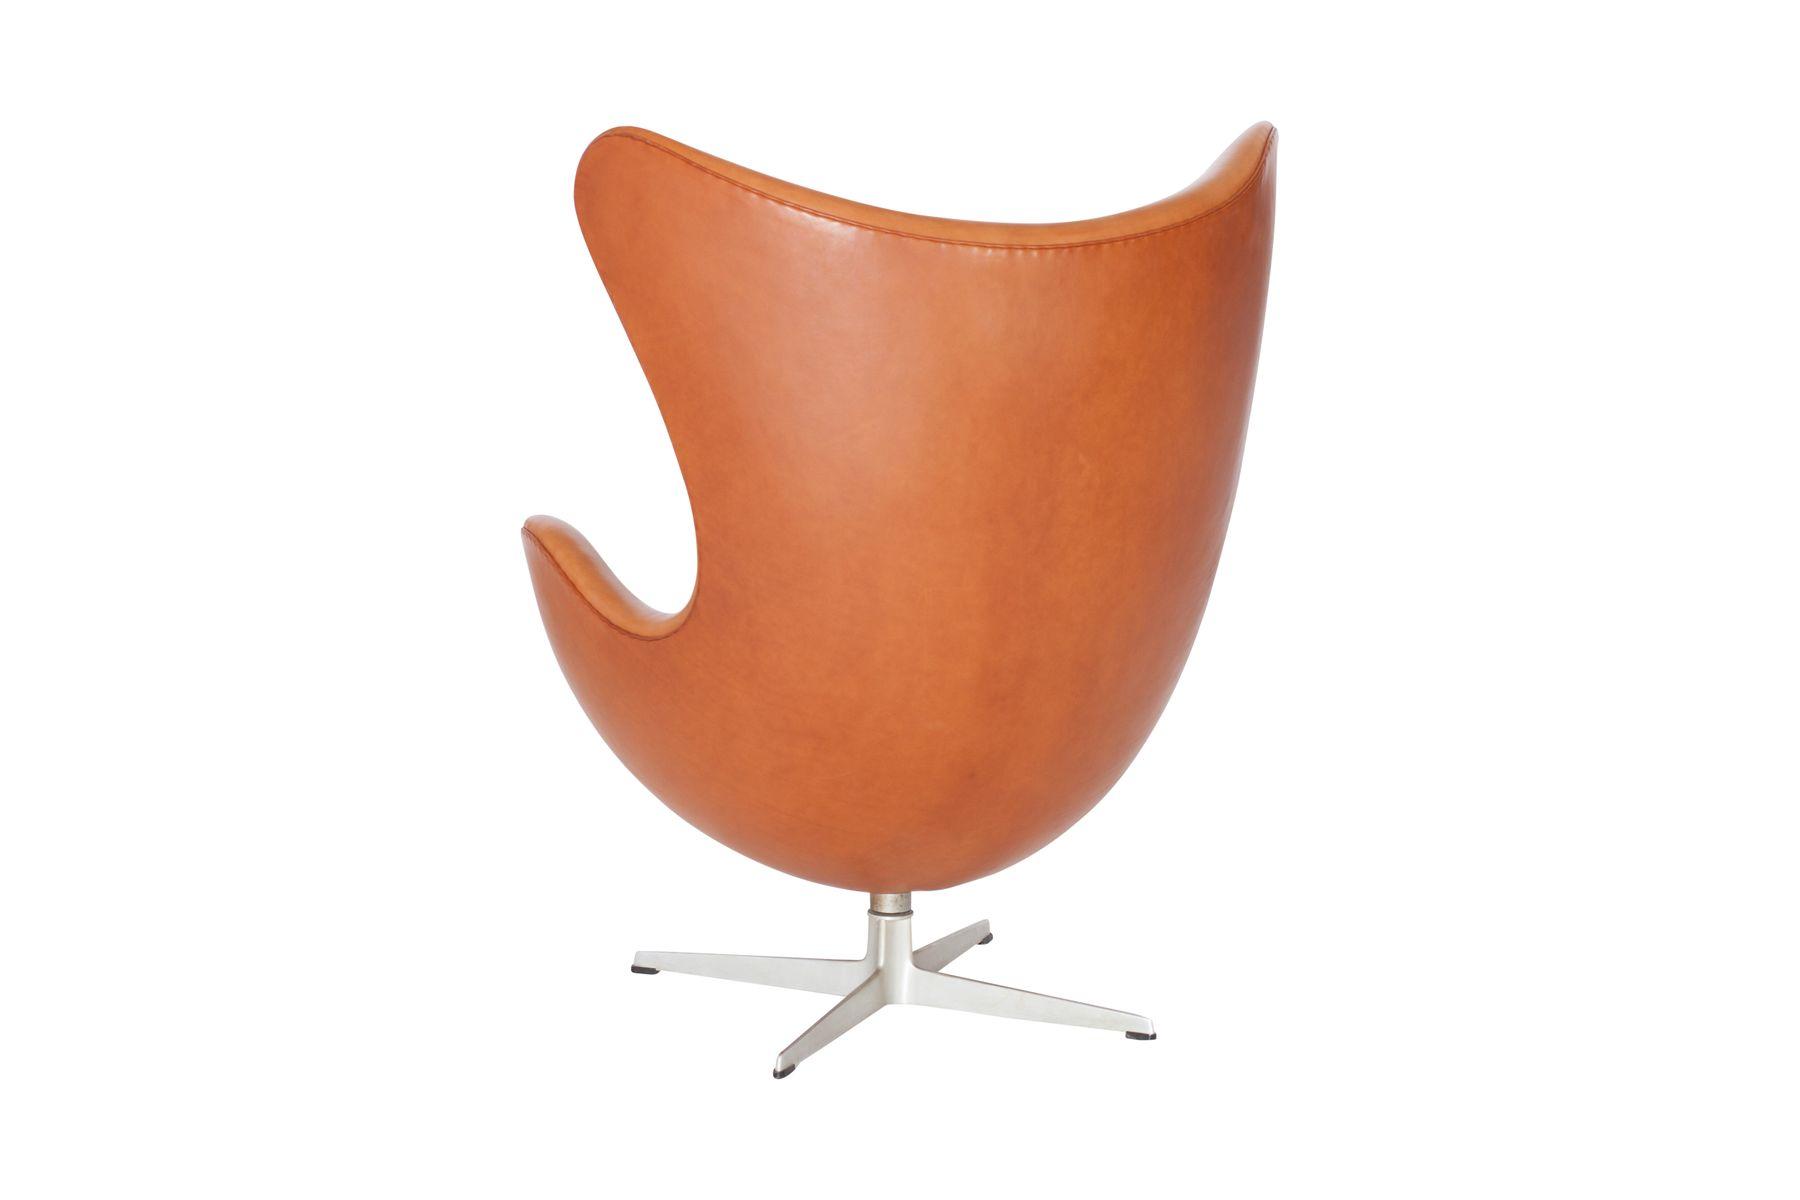 egg chair in cognac leather by arne jacobsen for fritz. Black Bedroom Furniture Sets. Home Design Ideas